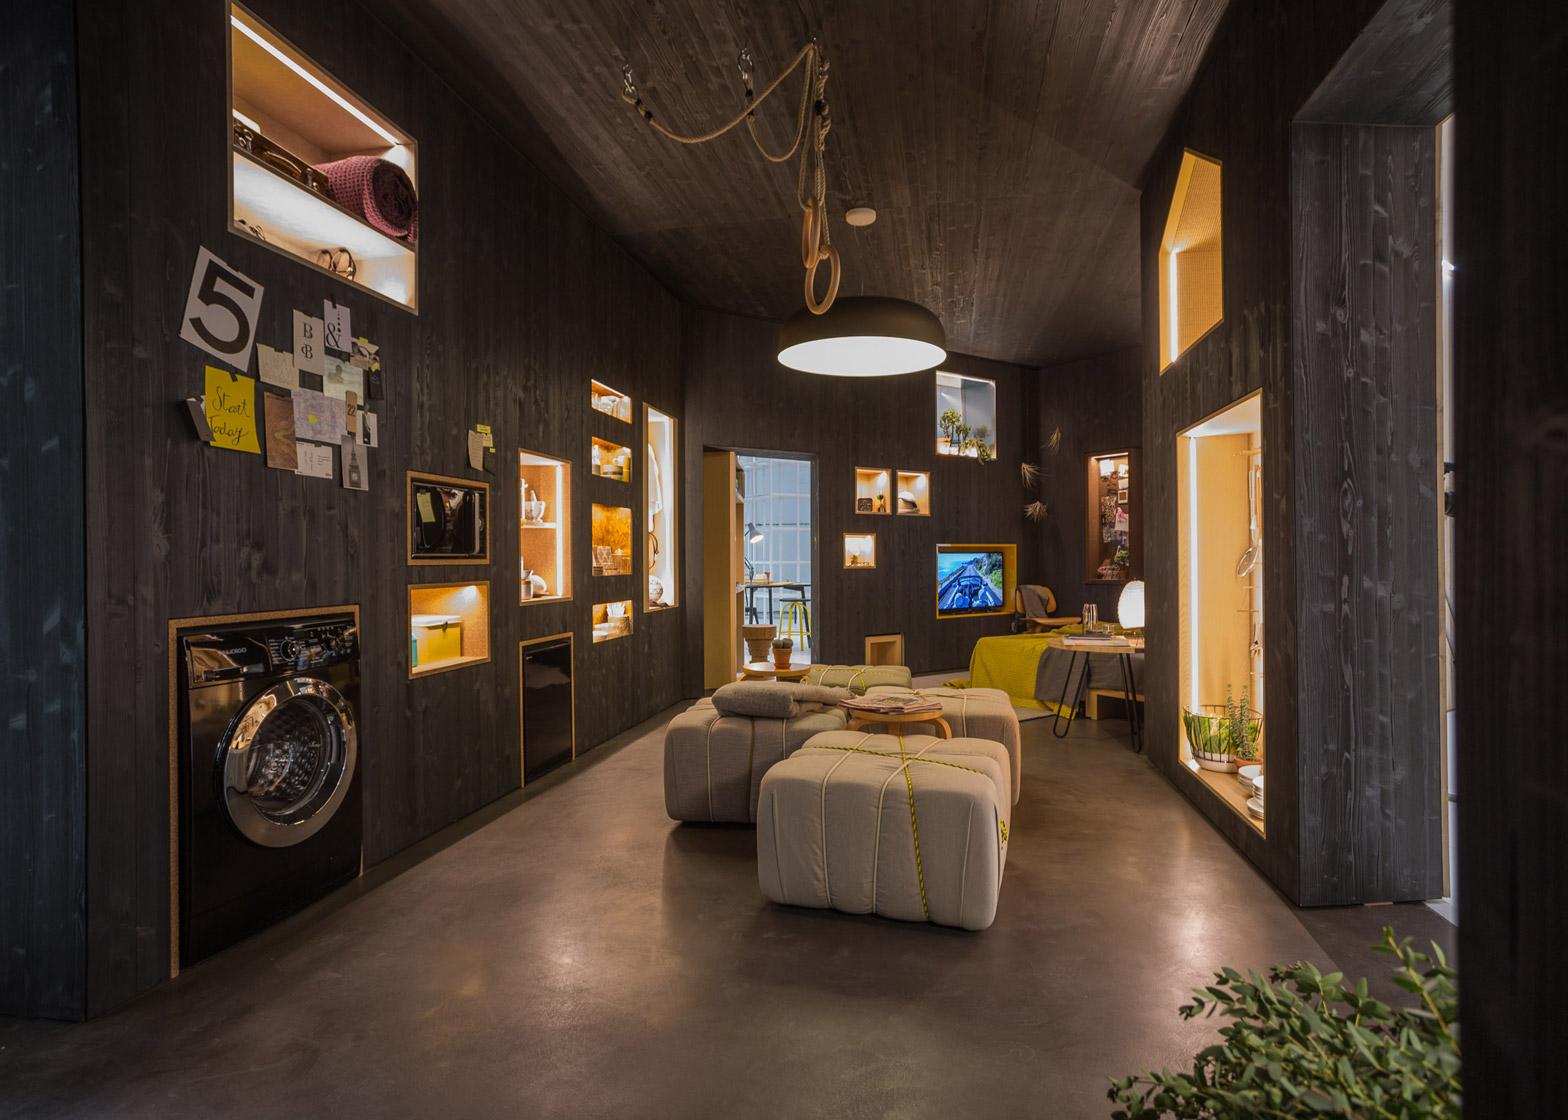 mini-living-installation-milan-design-week-2016_dezeen_1568_0